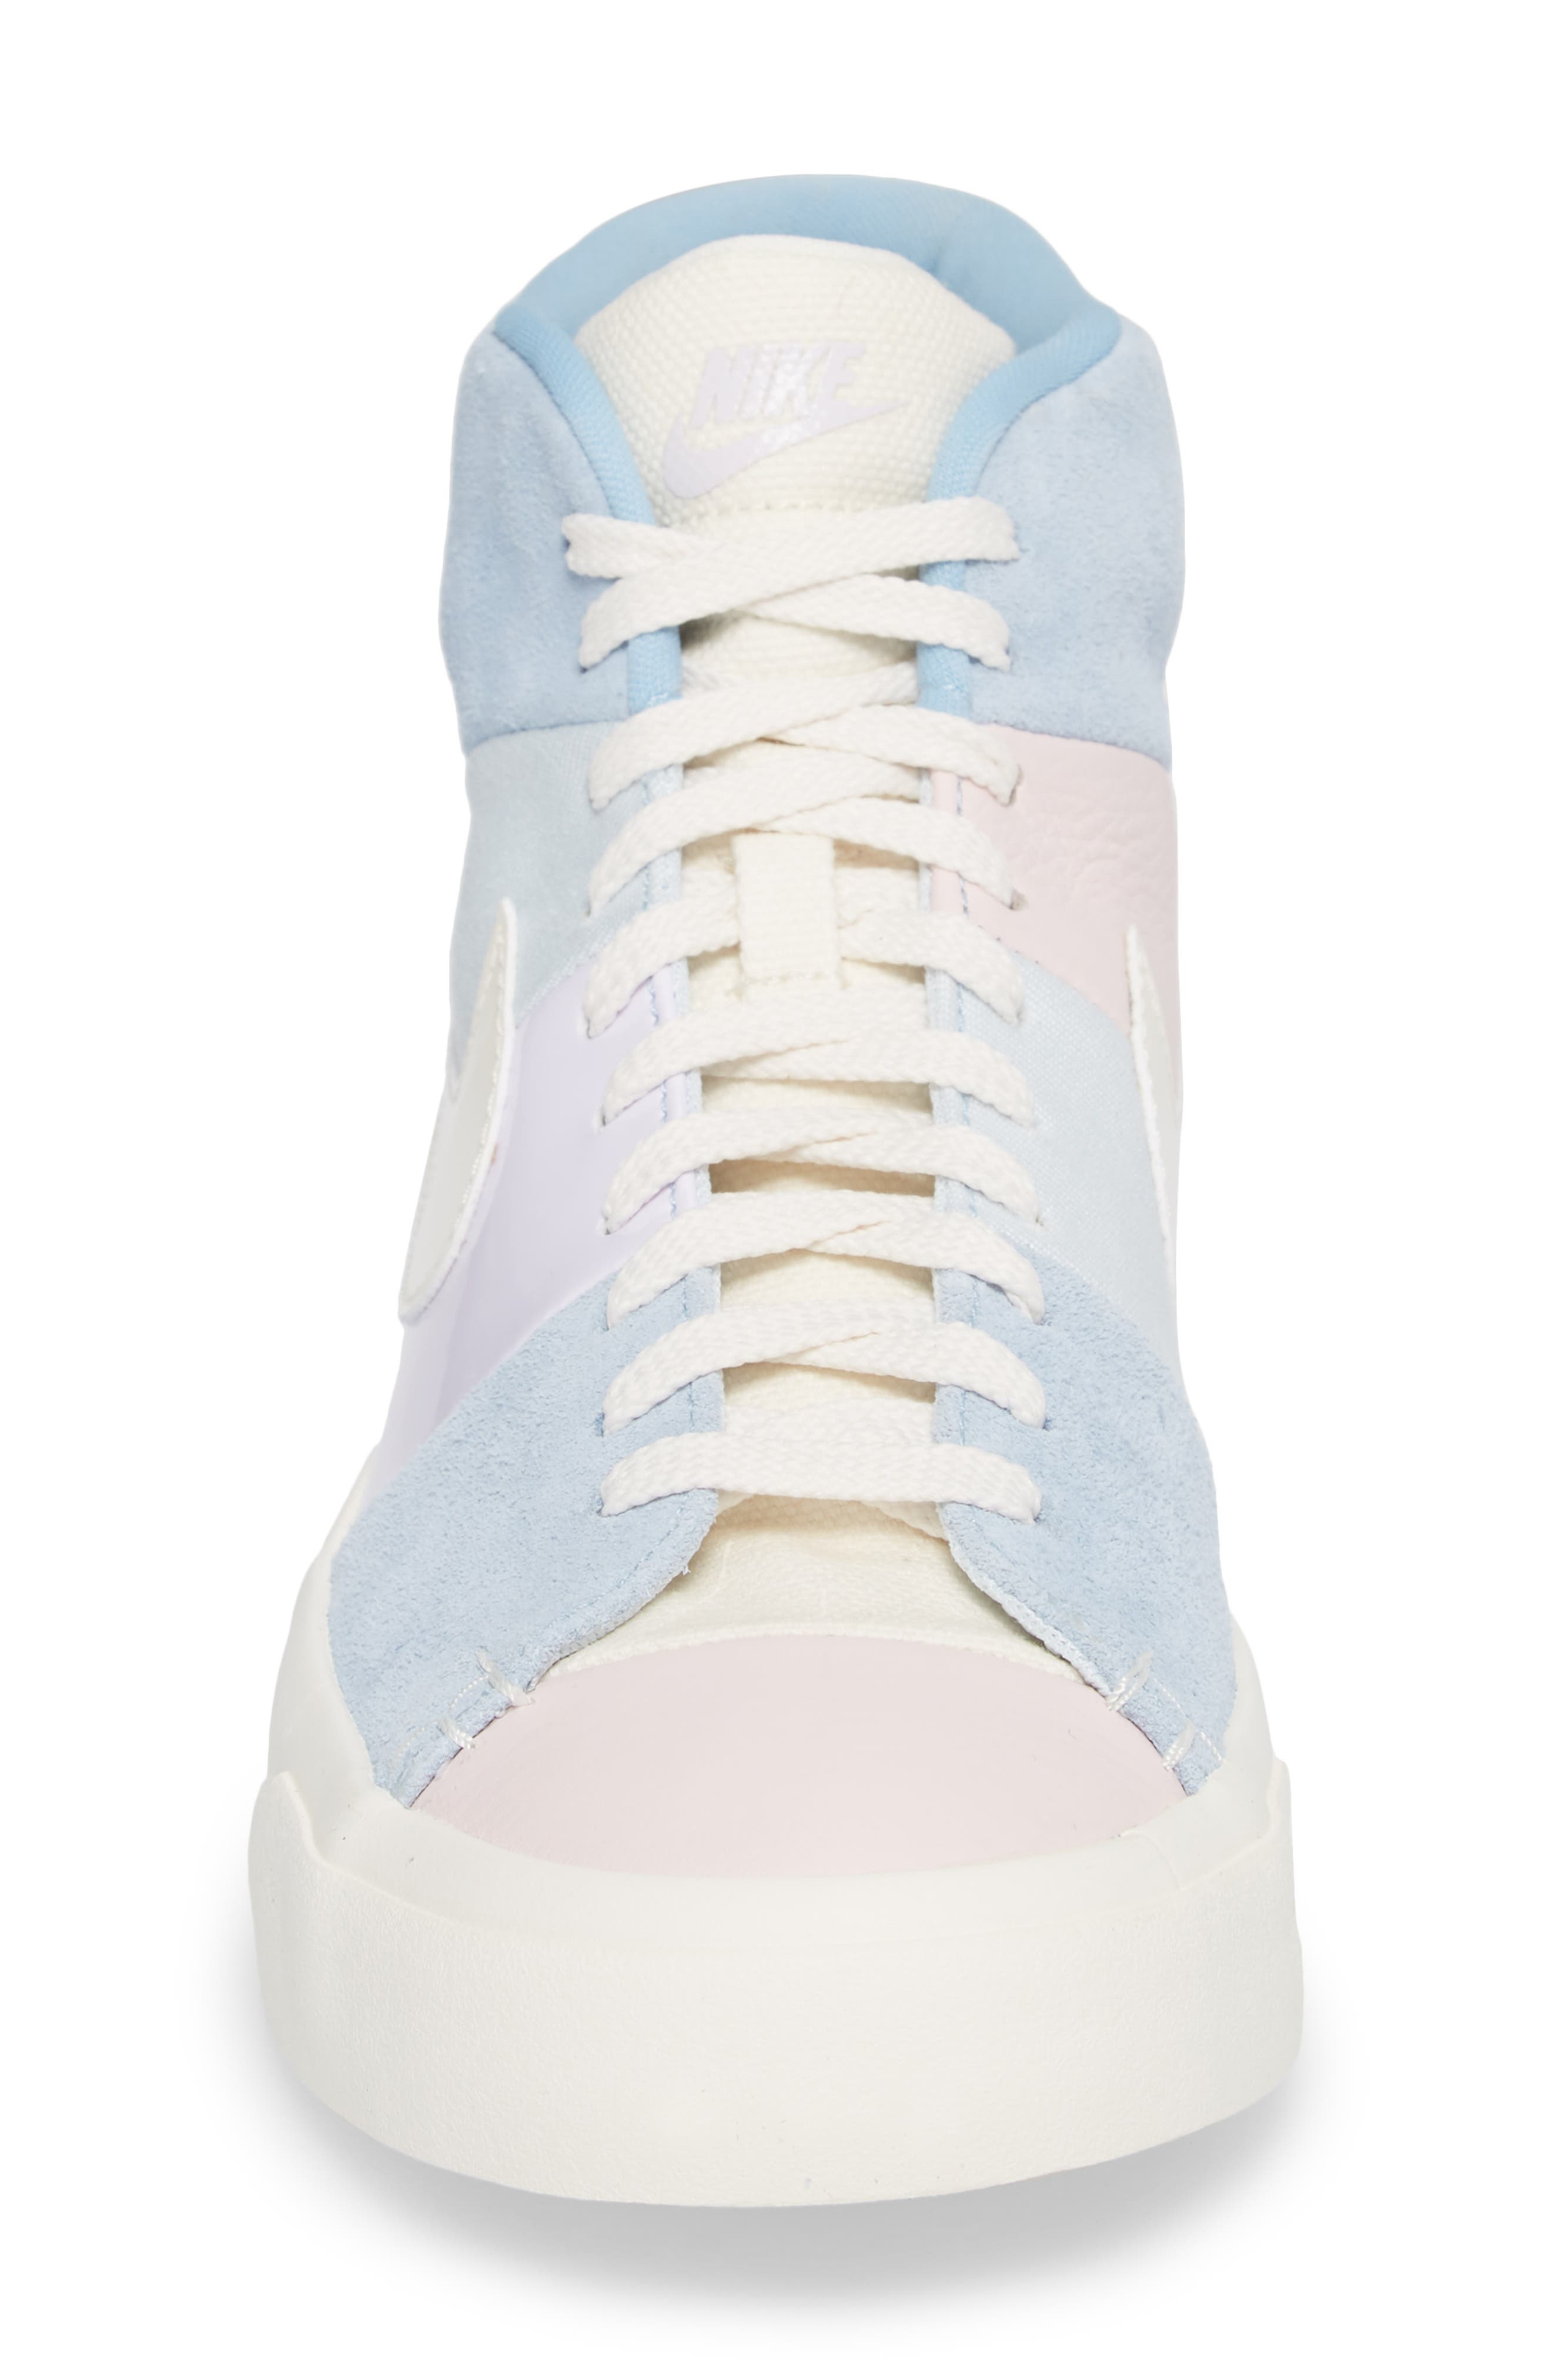 Blazer Royal Easter QS High Top Sneaker,                             Alternate thumbnail 4, color,                             Arctic Pink/ Sail-Blue-Blue